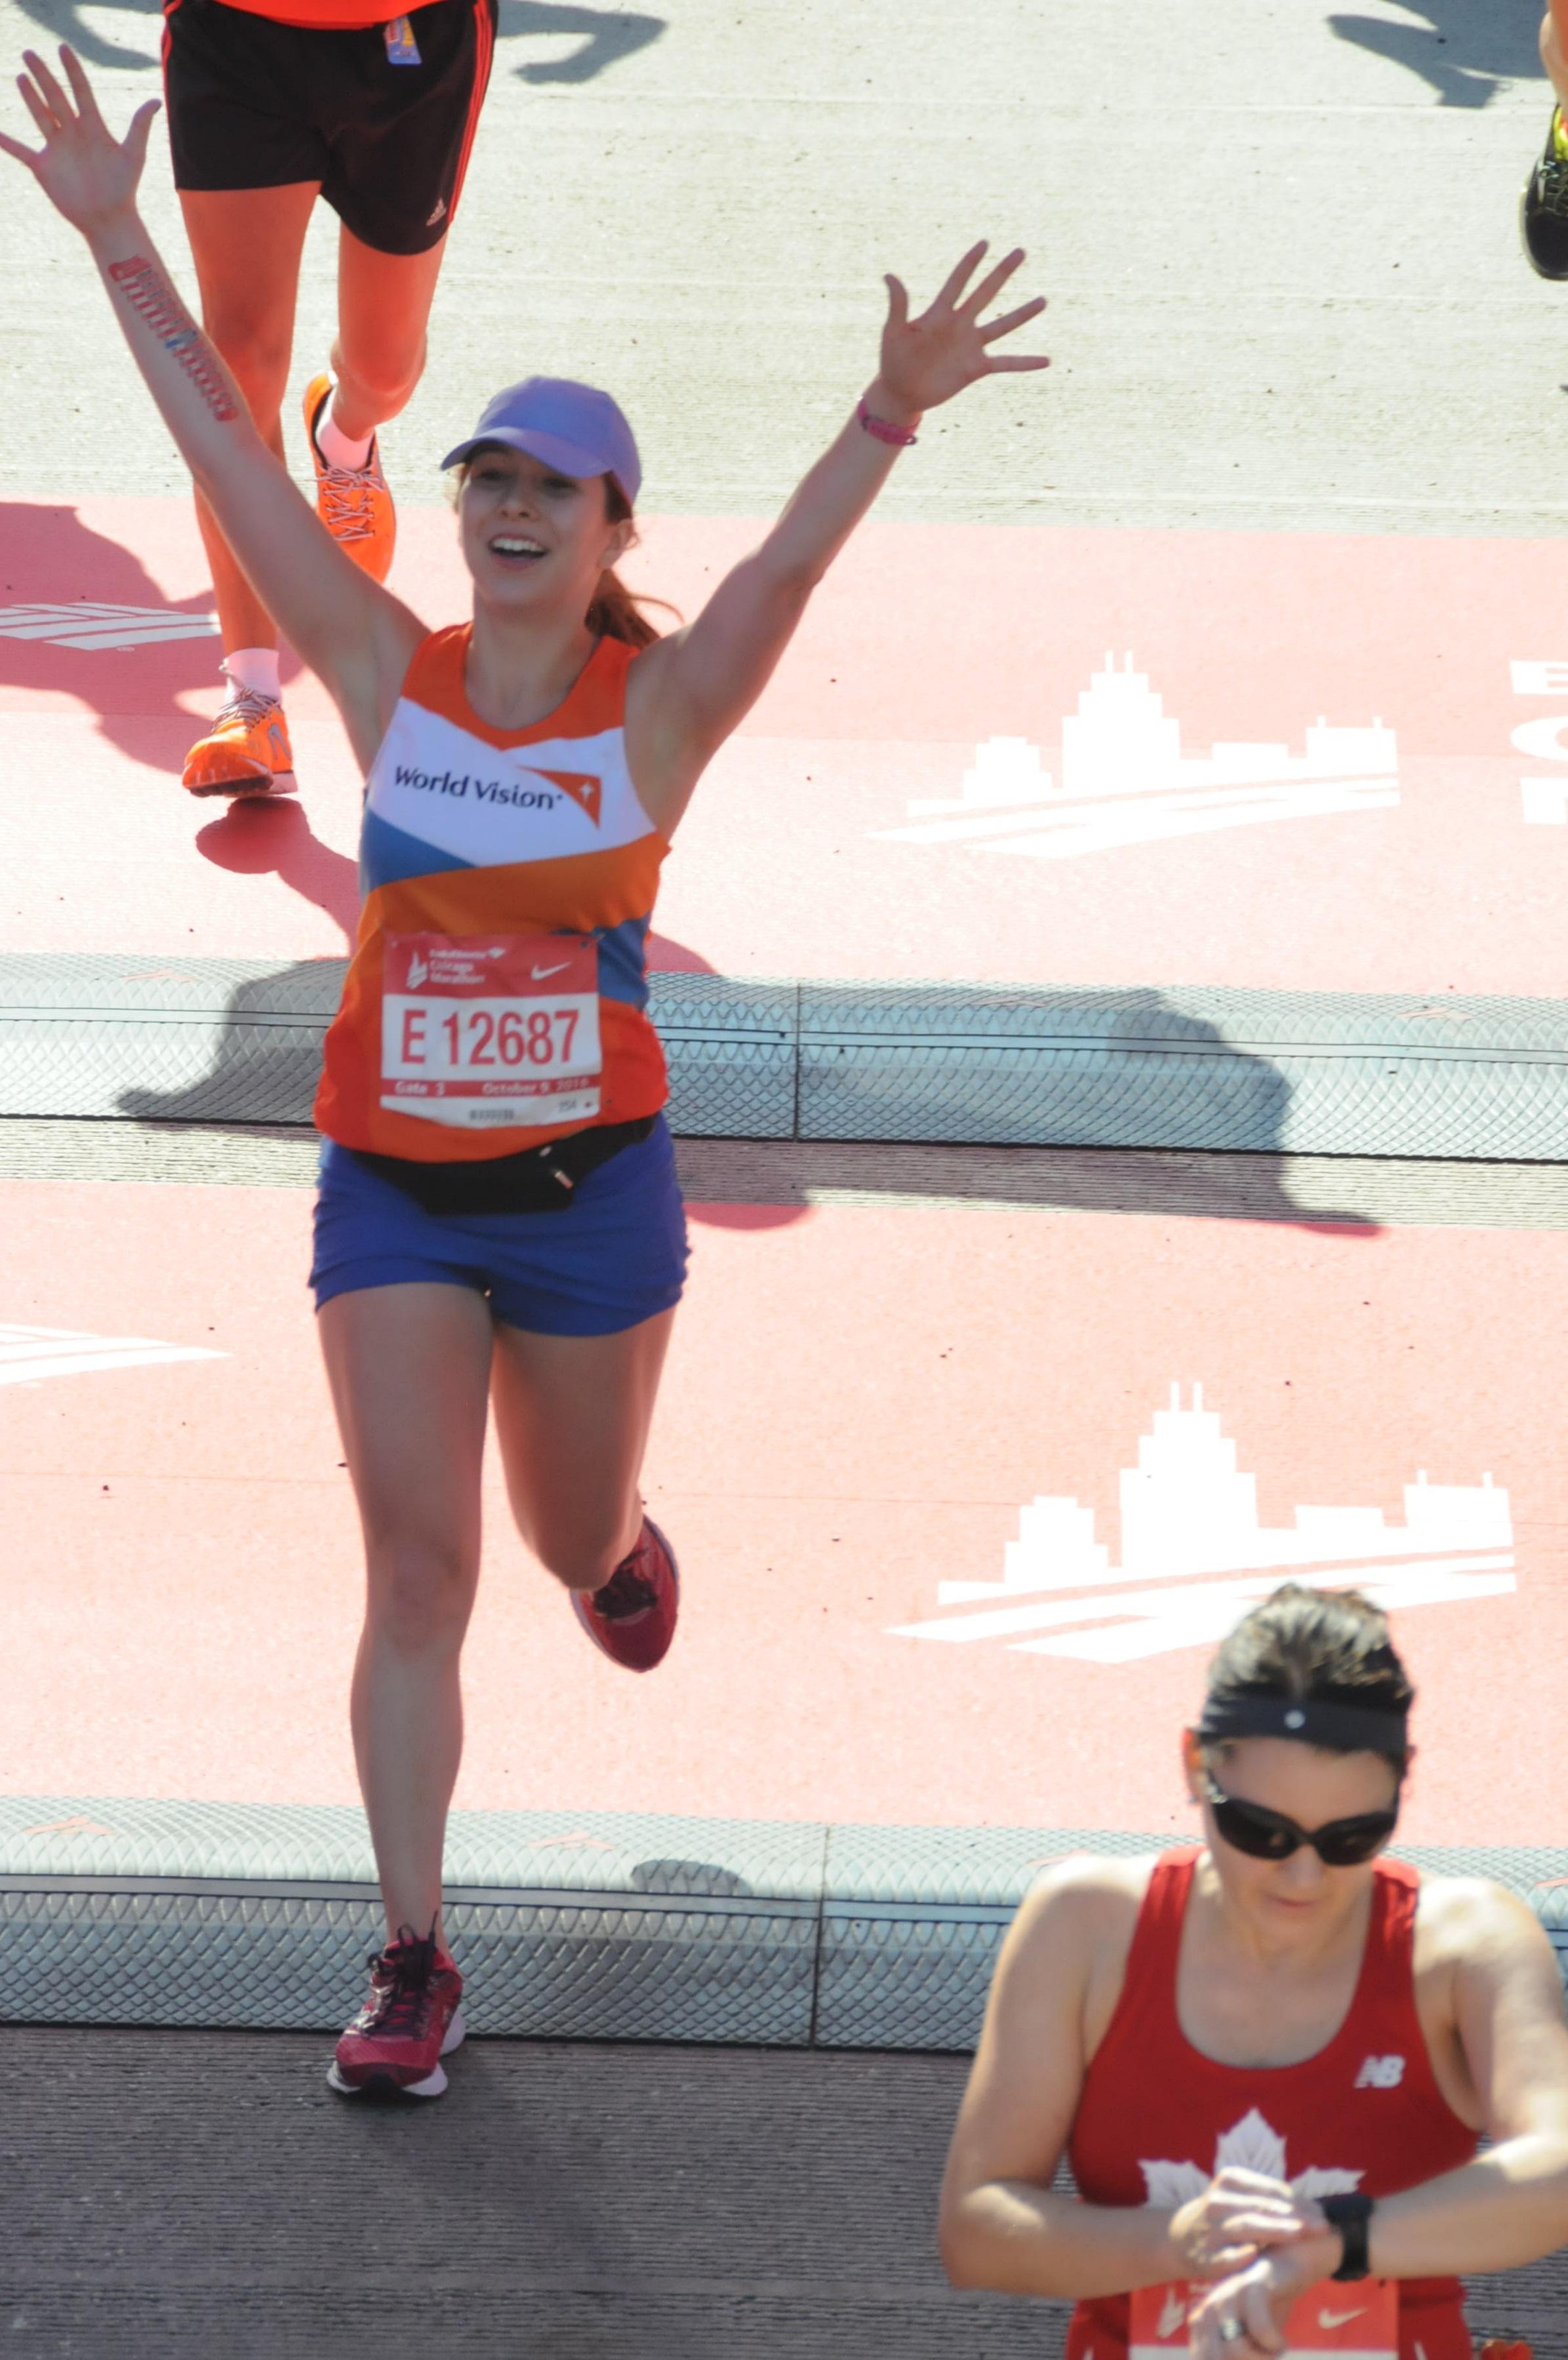 Finish line of The 2016 Chicago Marathon